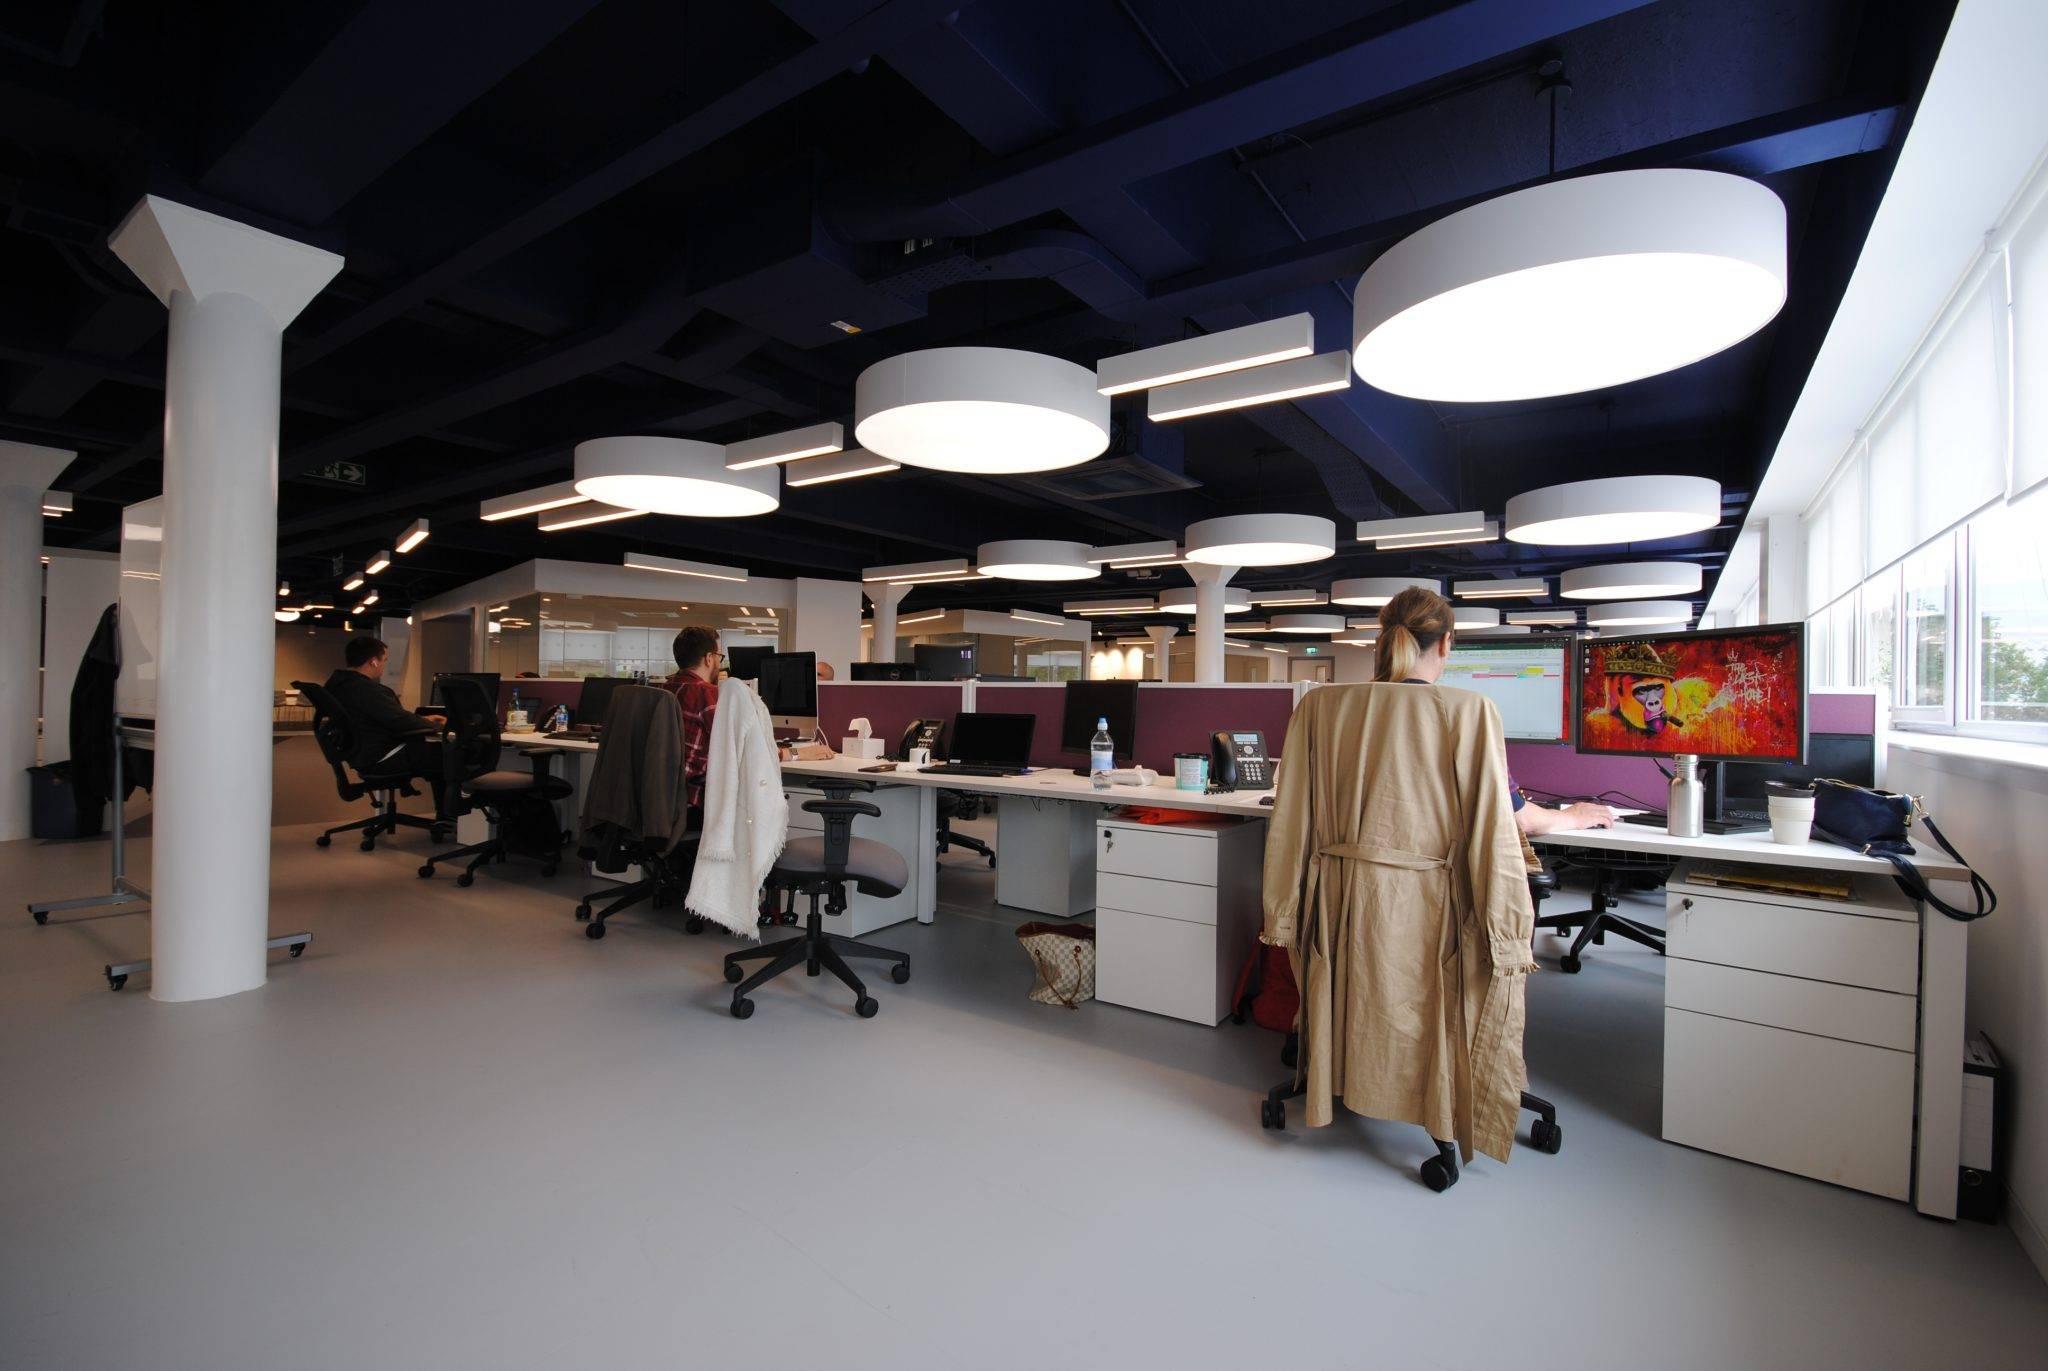 Architects Glasgow, Allison Architects Glasgow based Architects Serving the Central Belt of Scotland